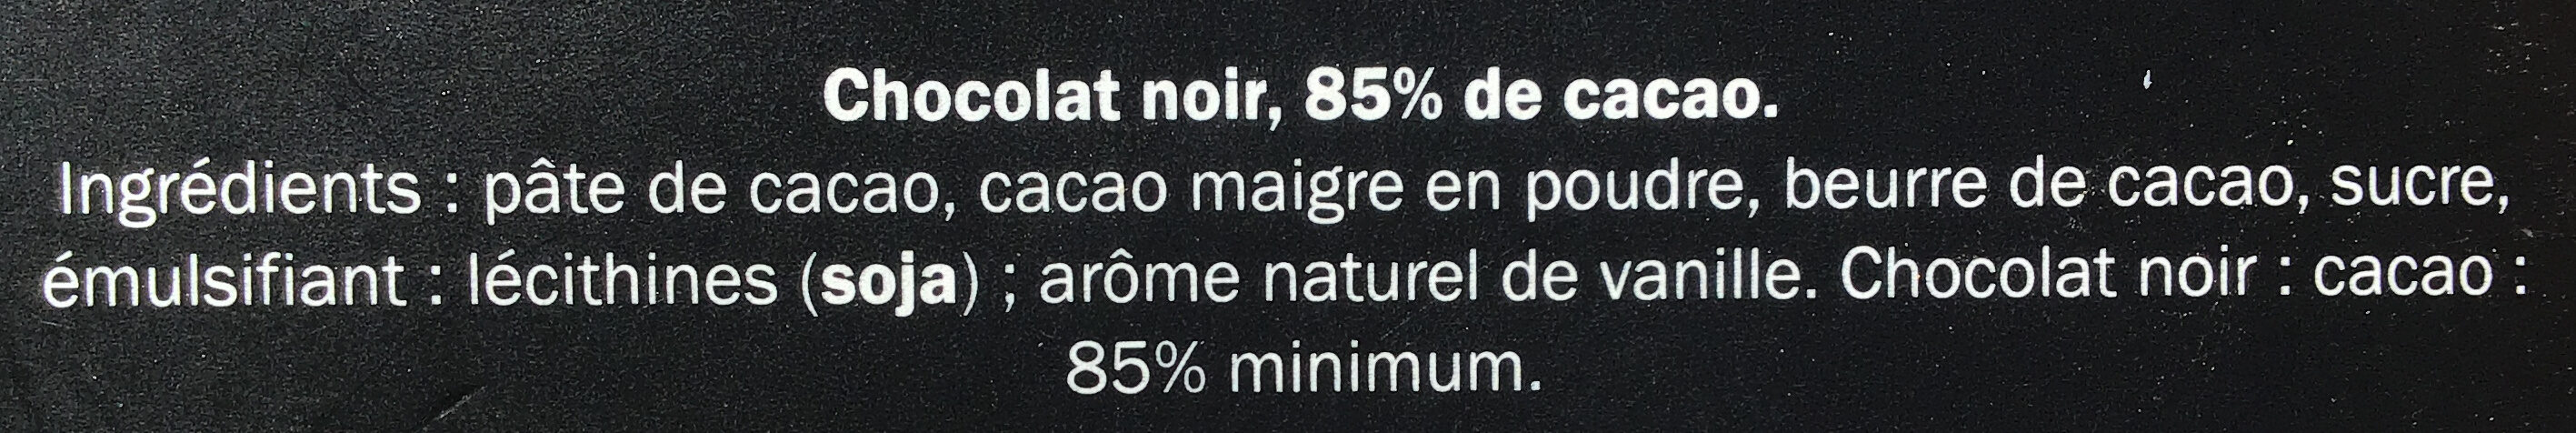 Chocolat noir Arriba 85% cacao - Ingredienti - fr